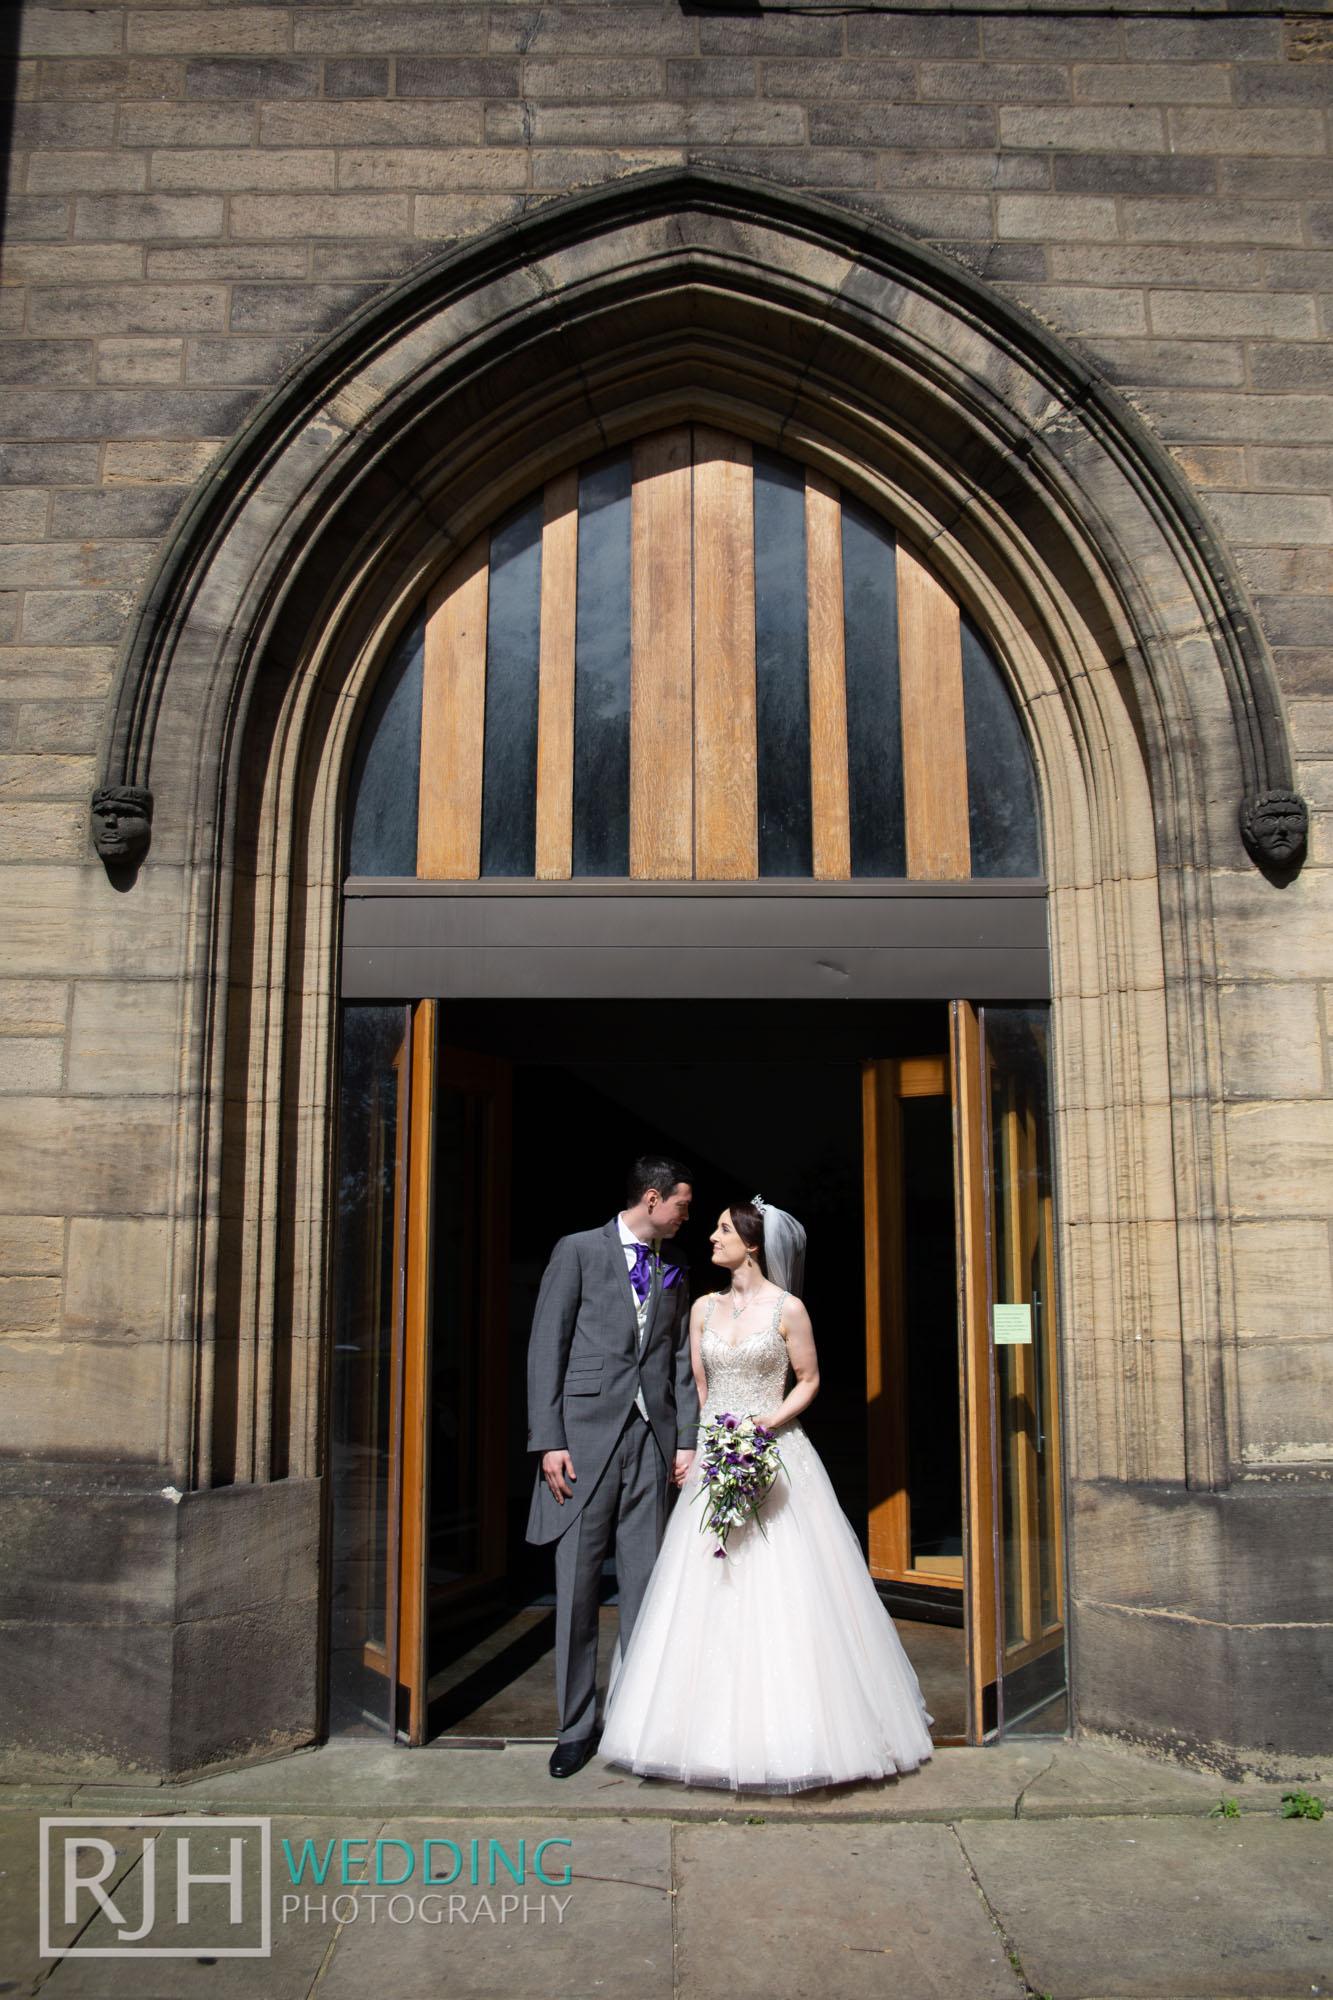 Oulton Hall Wedding Photography_Goodwill-Hall_028_IMG_6513.jpg